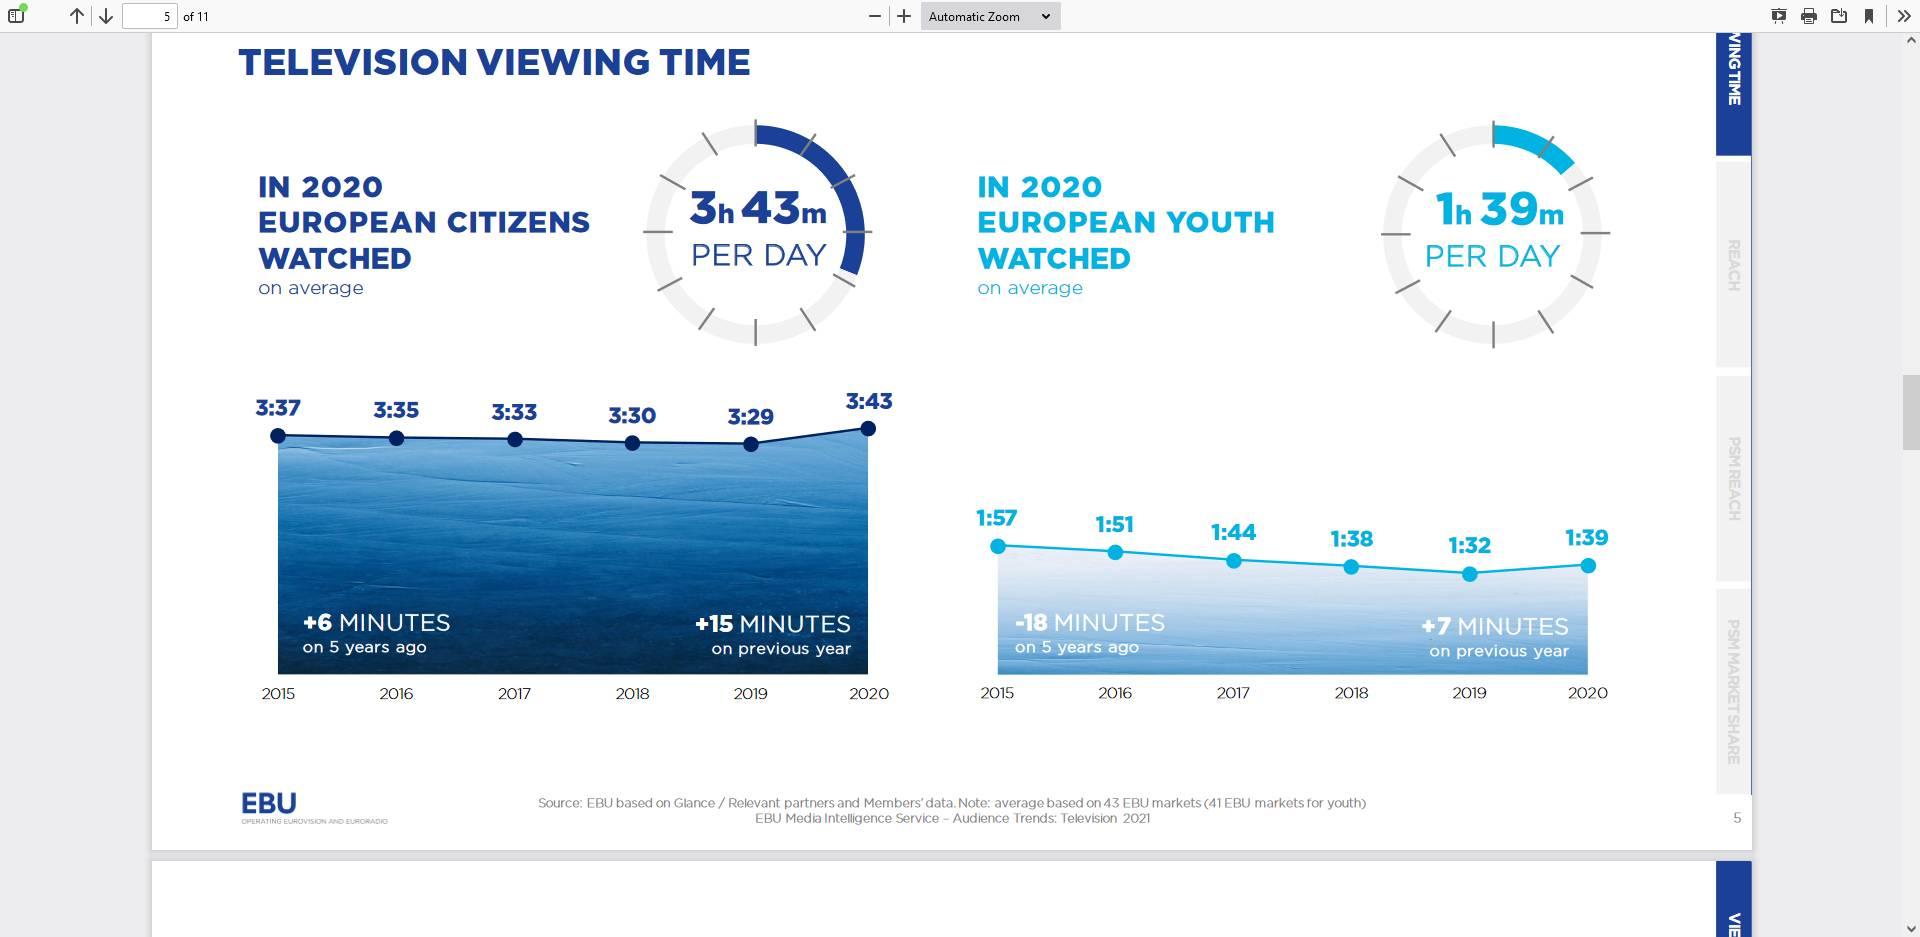 TV_Audience_Trends_-_EBU-MIS-TV_Audience_Trends_2021-public.pdf_-_2021-07-21_10.37.08